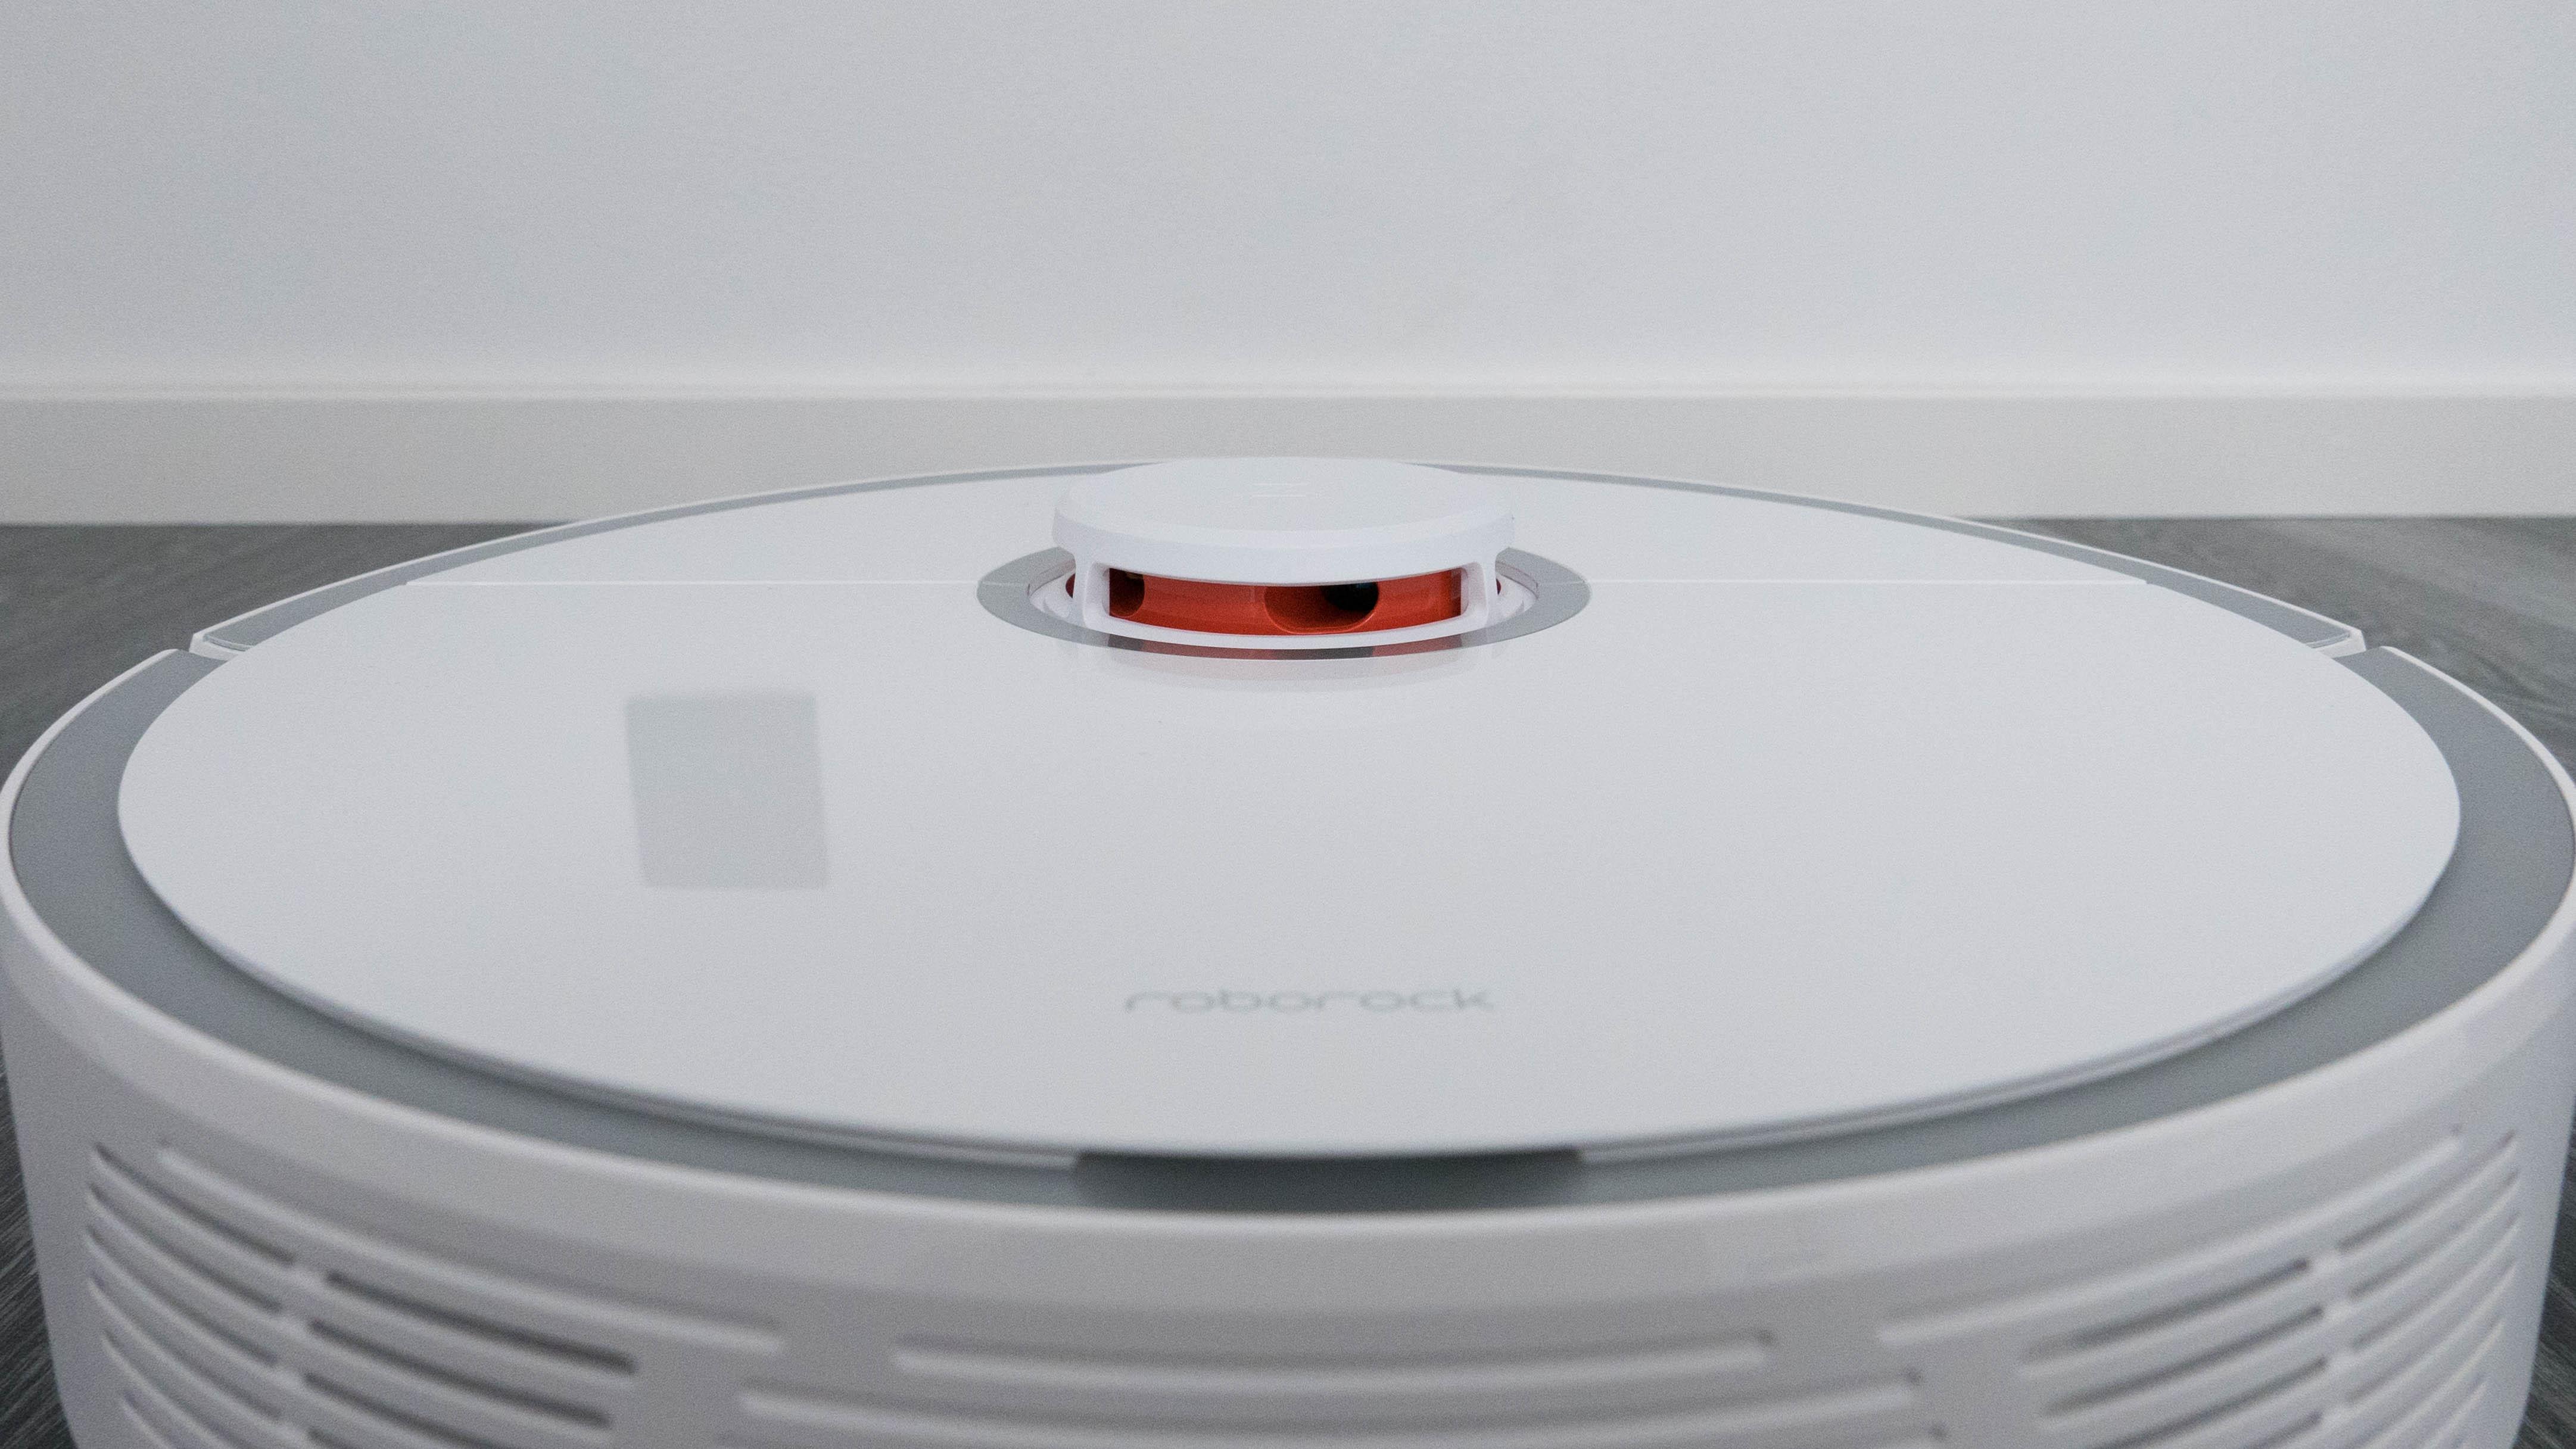 Xiaomi Mi Robot 2 Roborock S50 Roboter Details 9